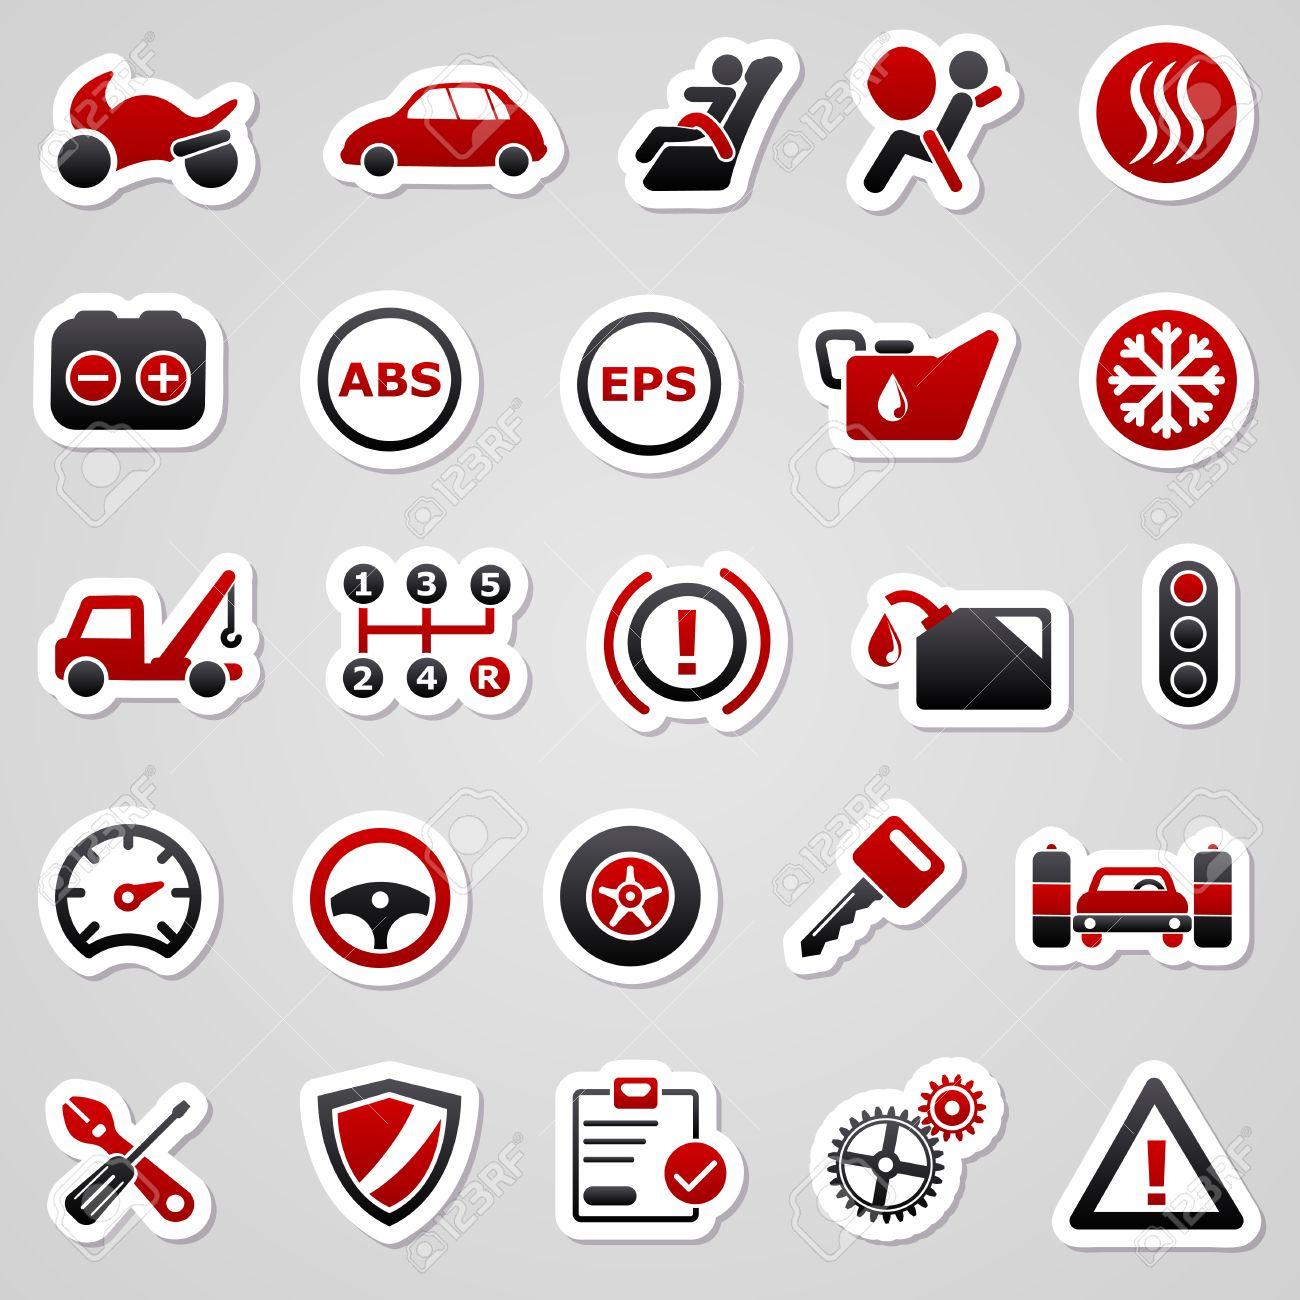 Car body sticker design eps - Car Bodywork Icons For Web Design Automotive Red Stickers